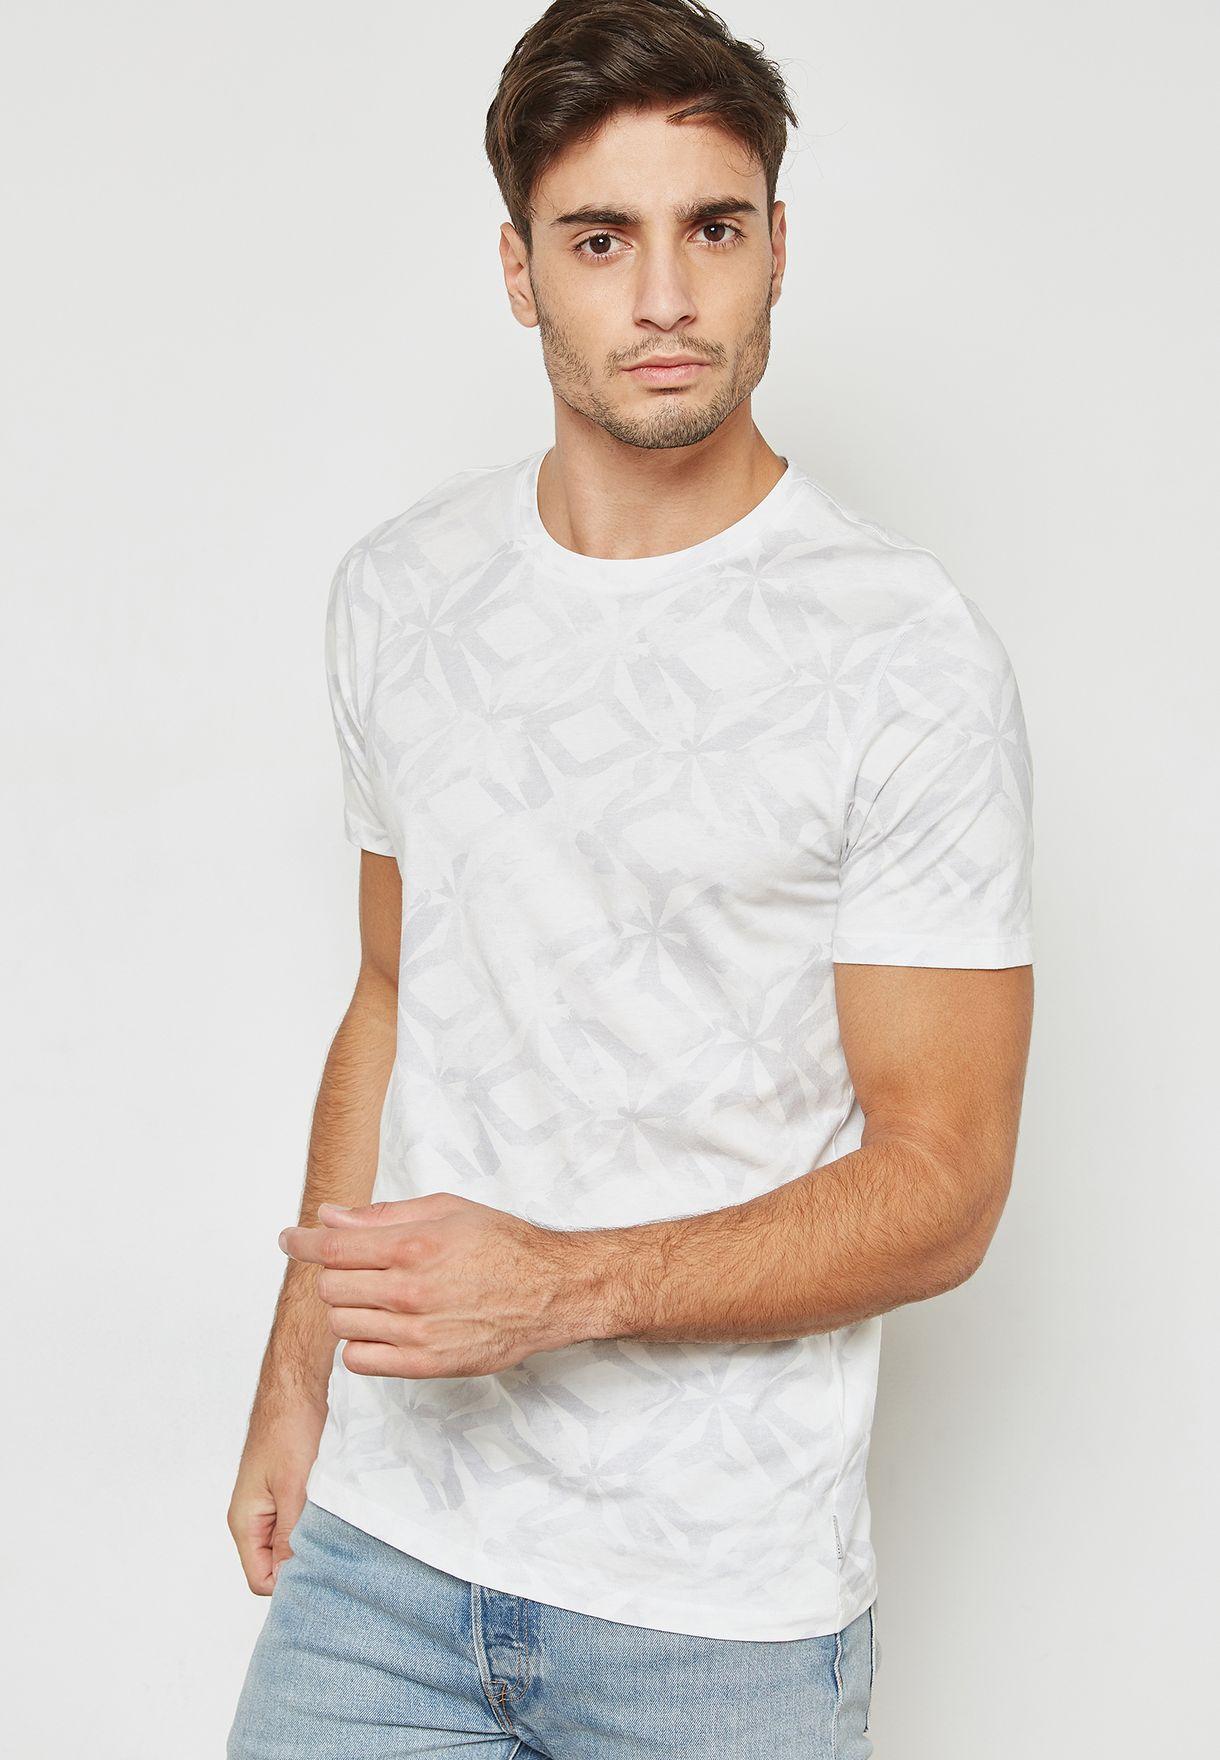 546b0e8ebbab17 Shop Ted baker prints Woof Geo Print T-Shirt 141493 for Men in Qatar -  TE456AT72QSX